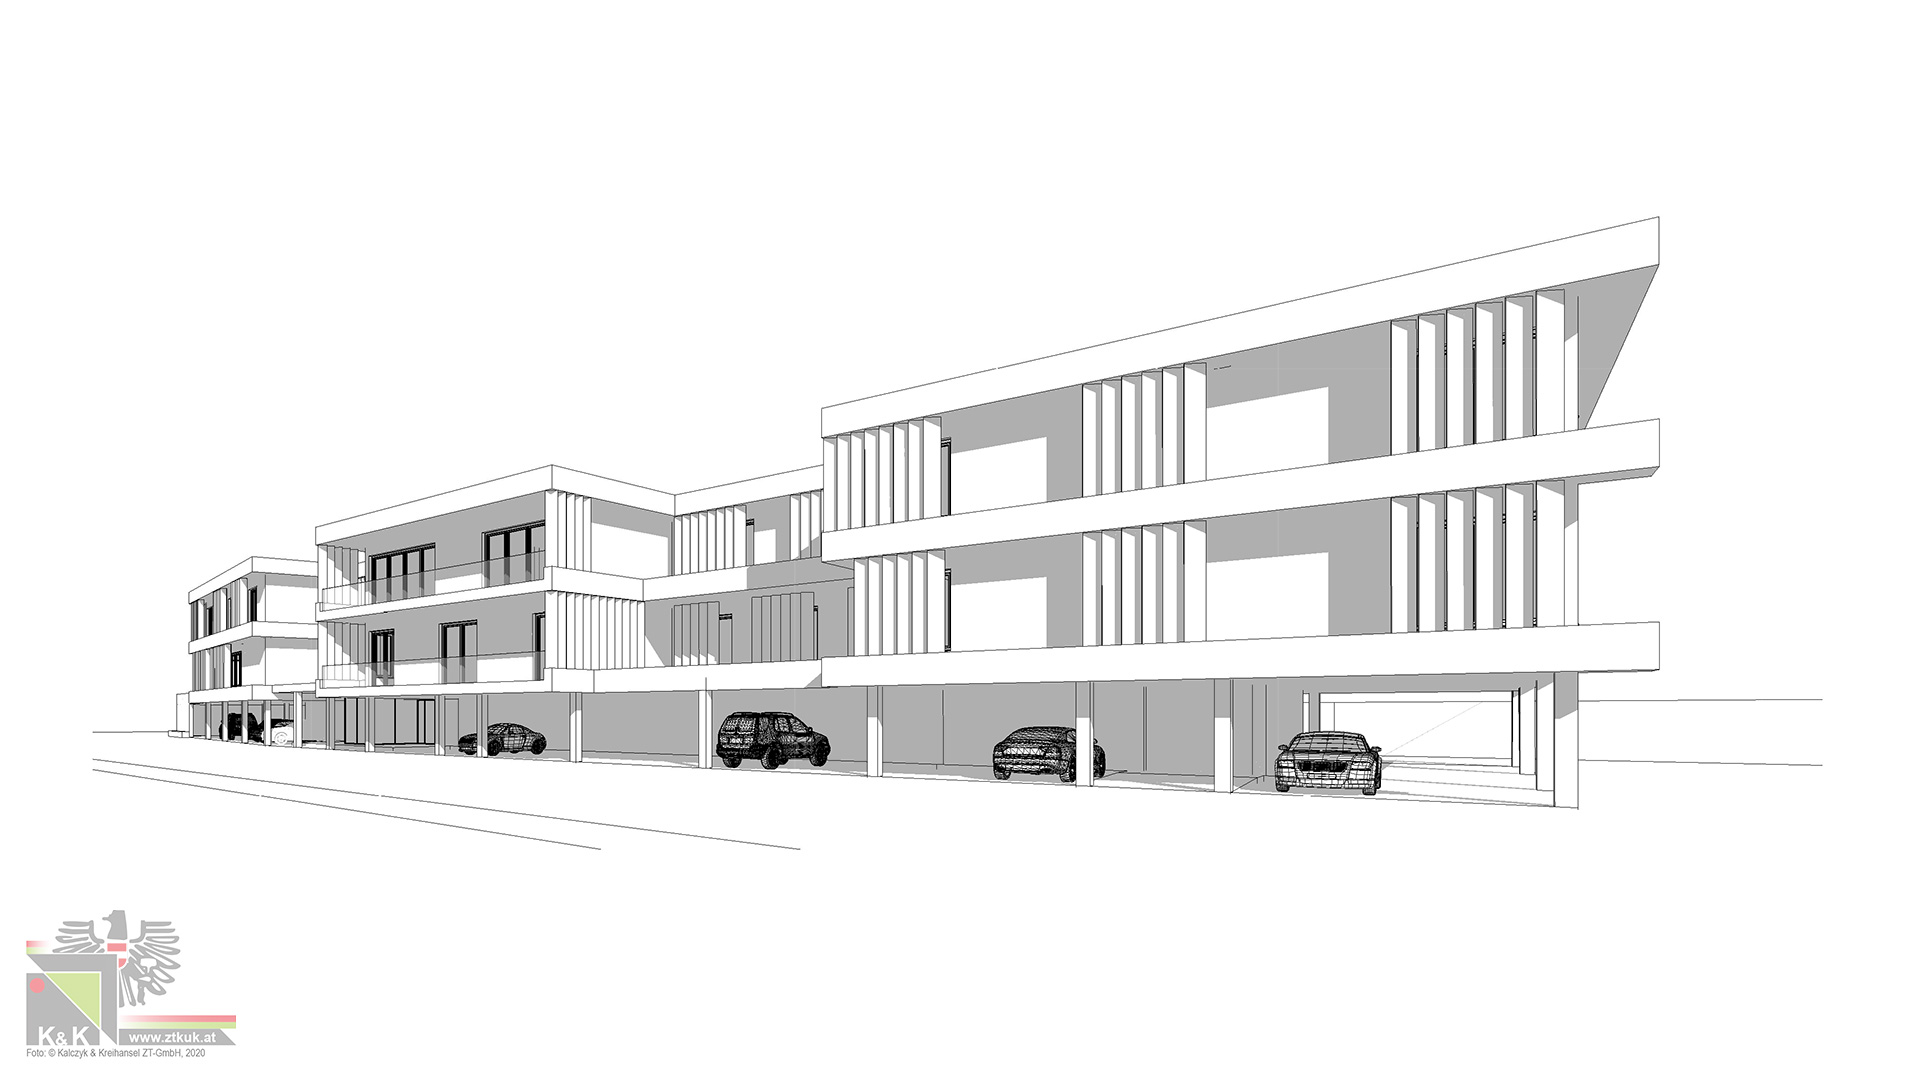 Drathmodell Bürogebäude